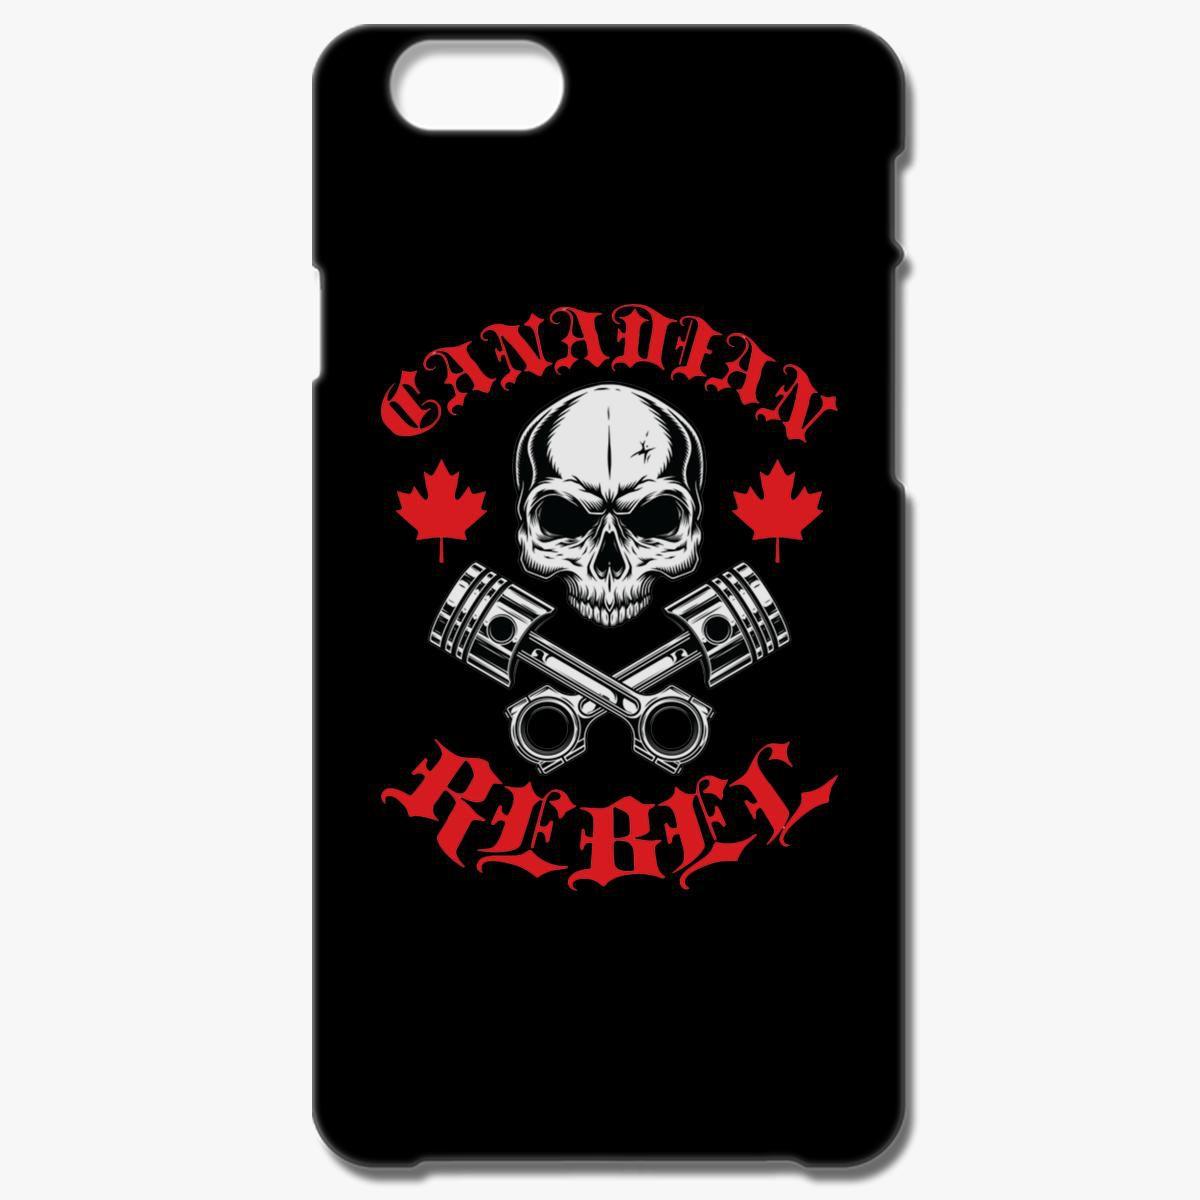 buy online a32a7 329e4 Canadian Rebel iPhone 6/6S Plus Case - Customon